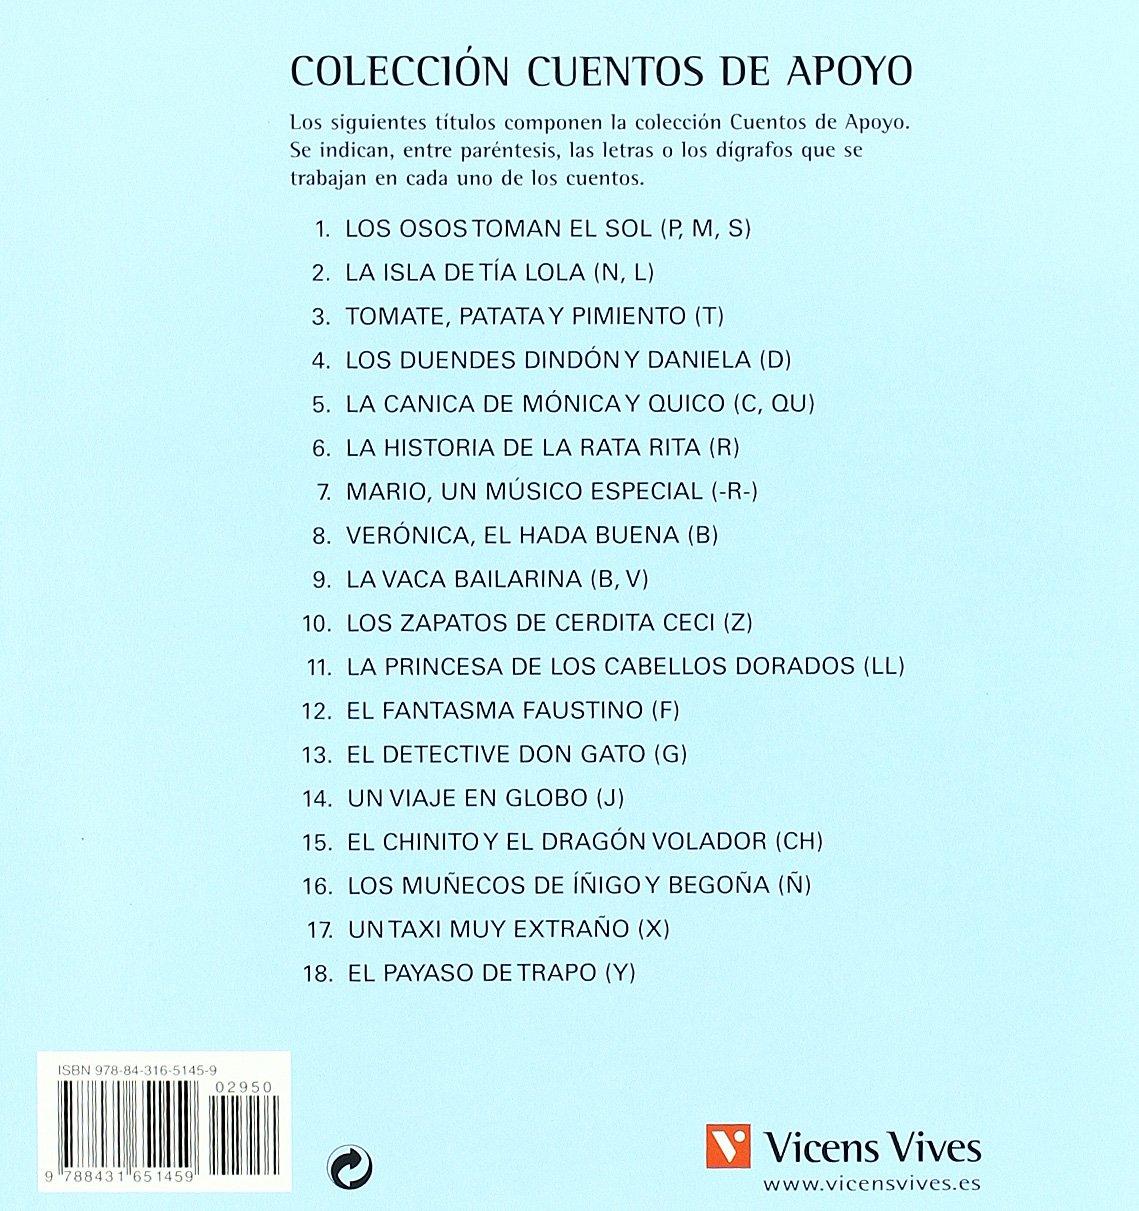 Amazon.com: Mario, un musico especial / Mario, a special musician (Serie Azul / Blue Series) (Spanish Edition) (9788431651459): Carmen Rodriguez, ...